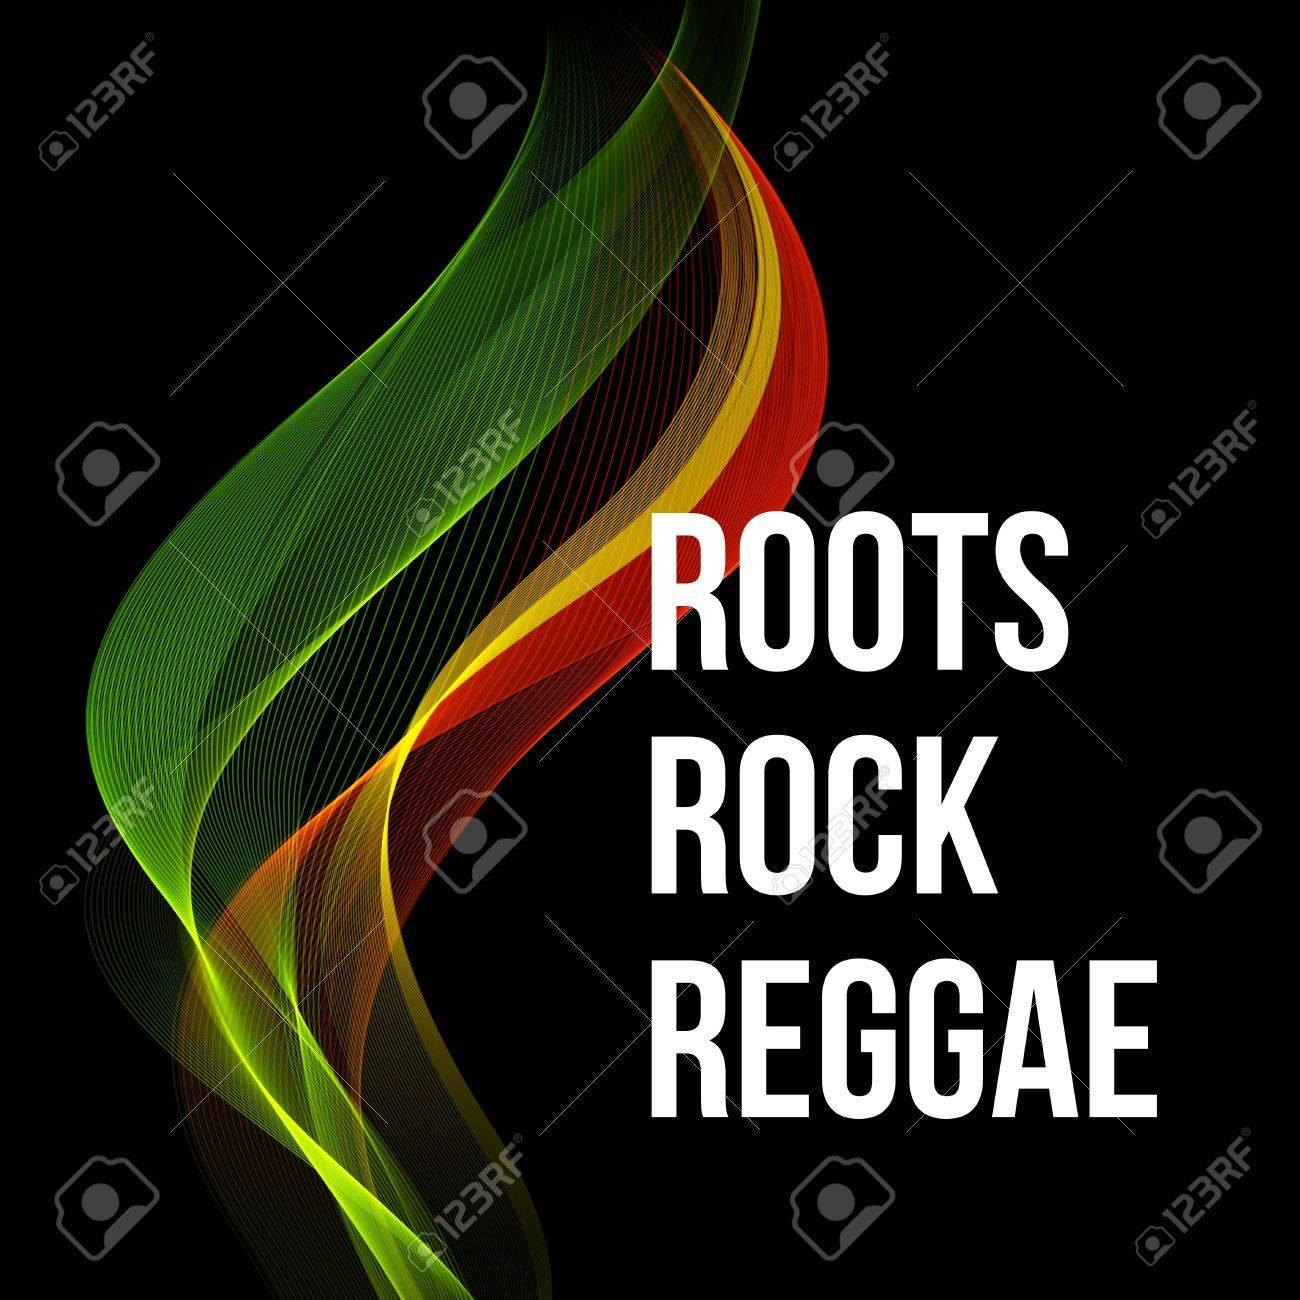 Poster design eps - Reggae Color Wave Poster Design Vector Illustration Eps 10 Stock Vector 46601567